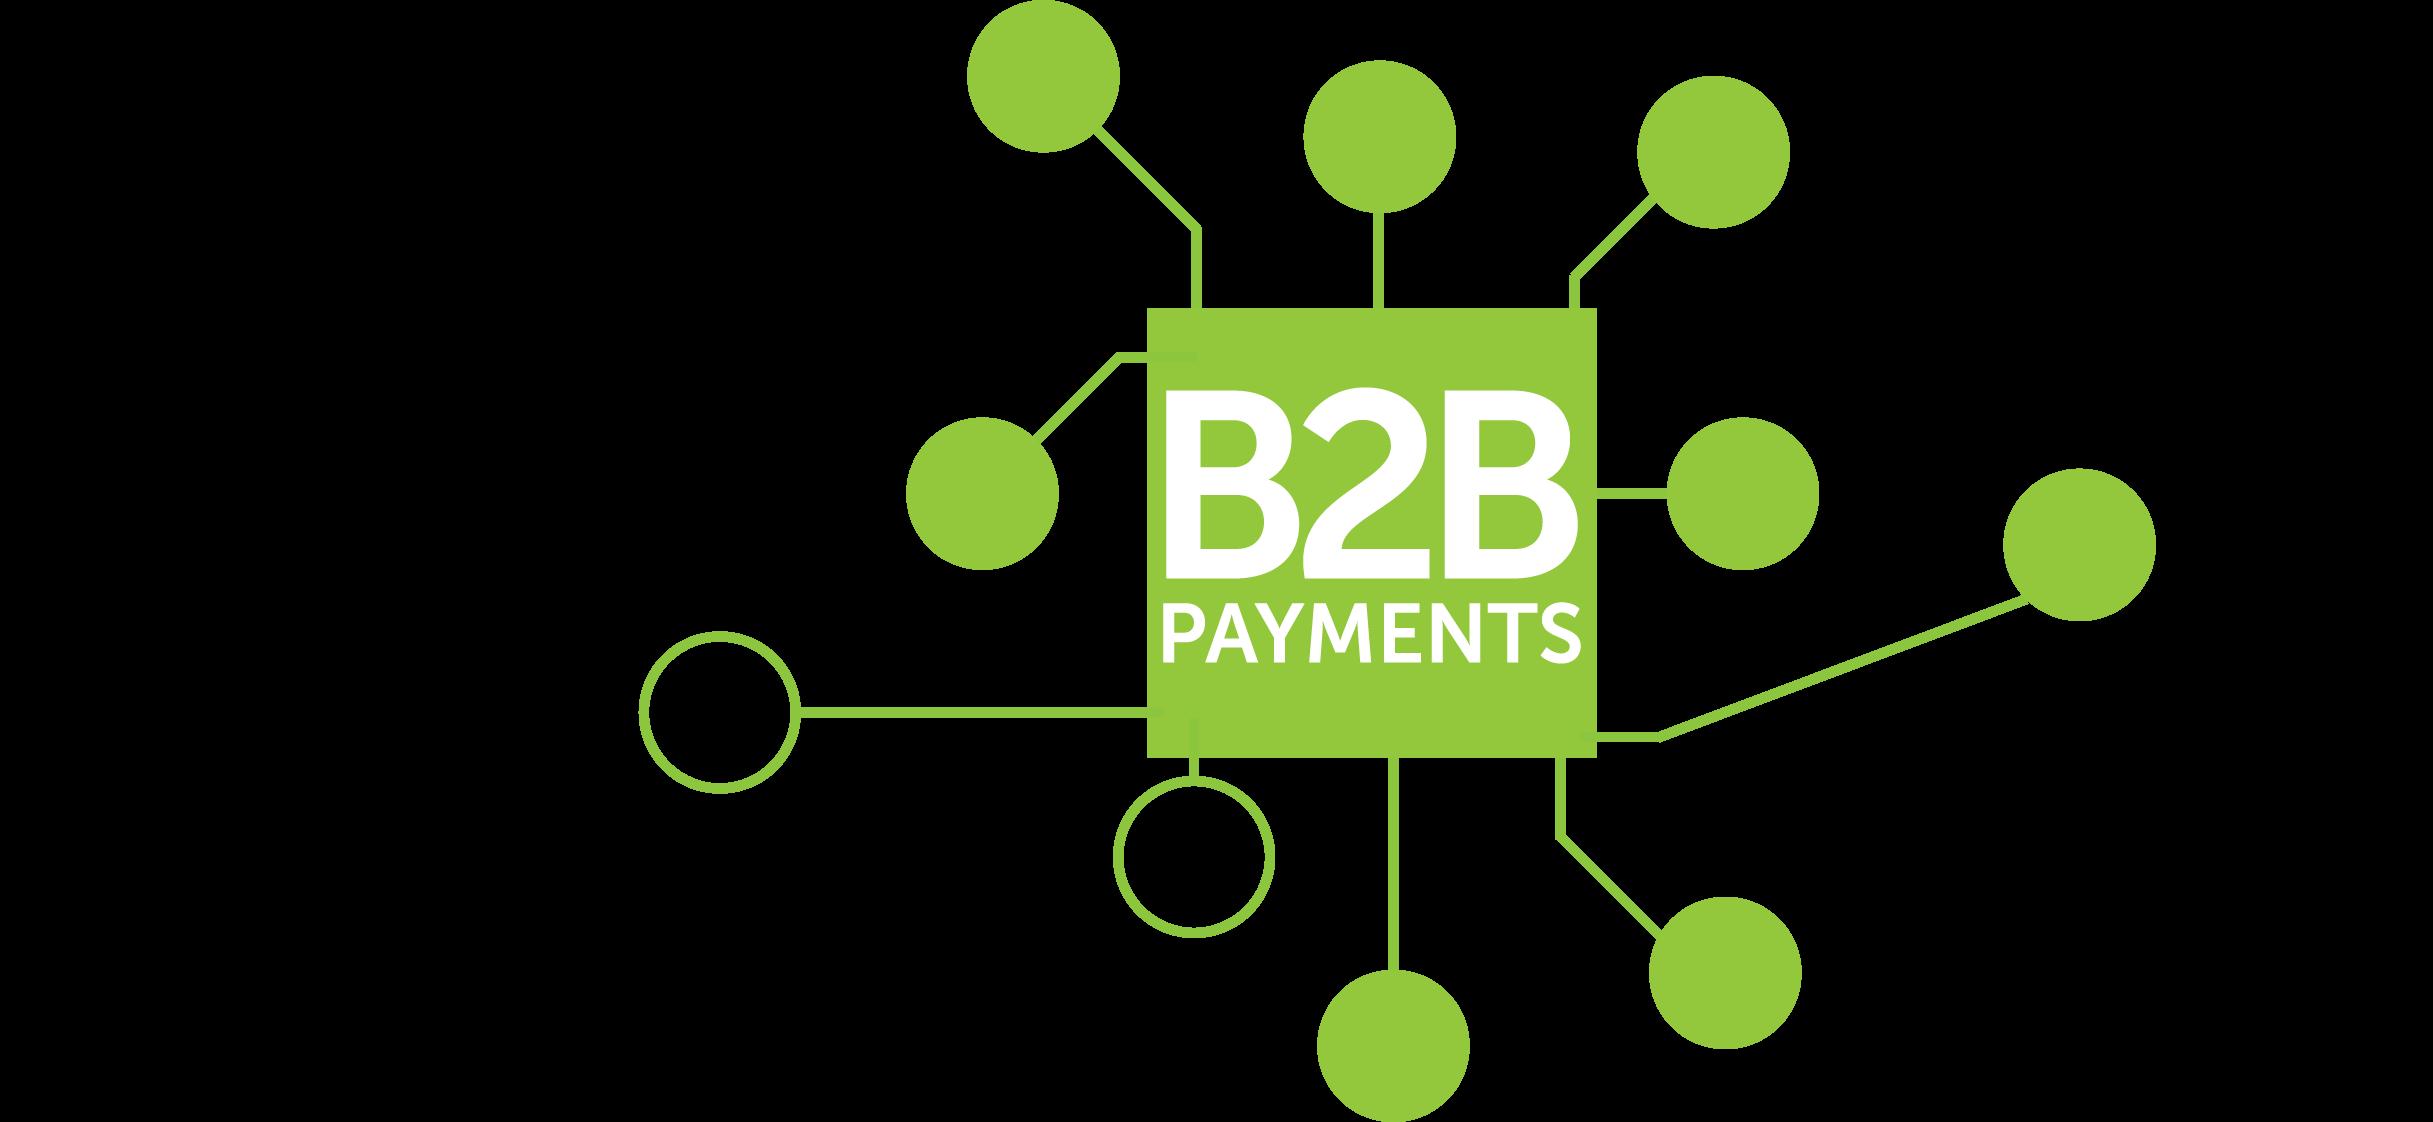 B2B-PAYMENTS-blog-art.png